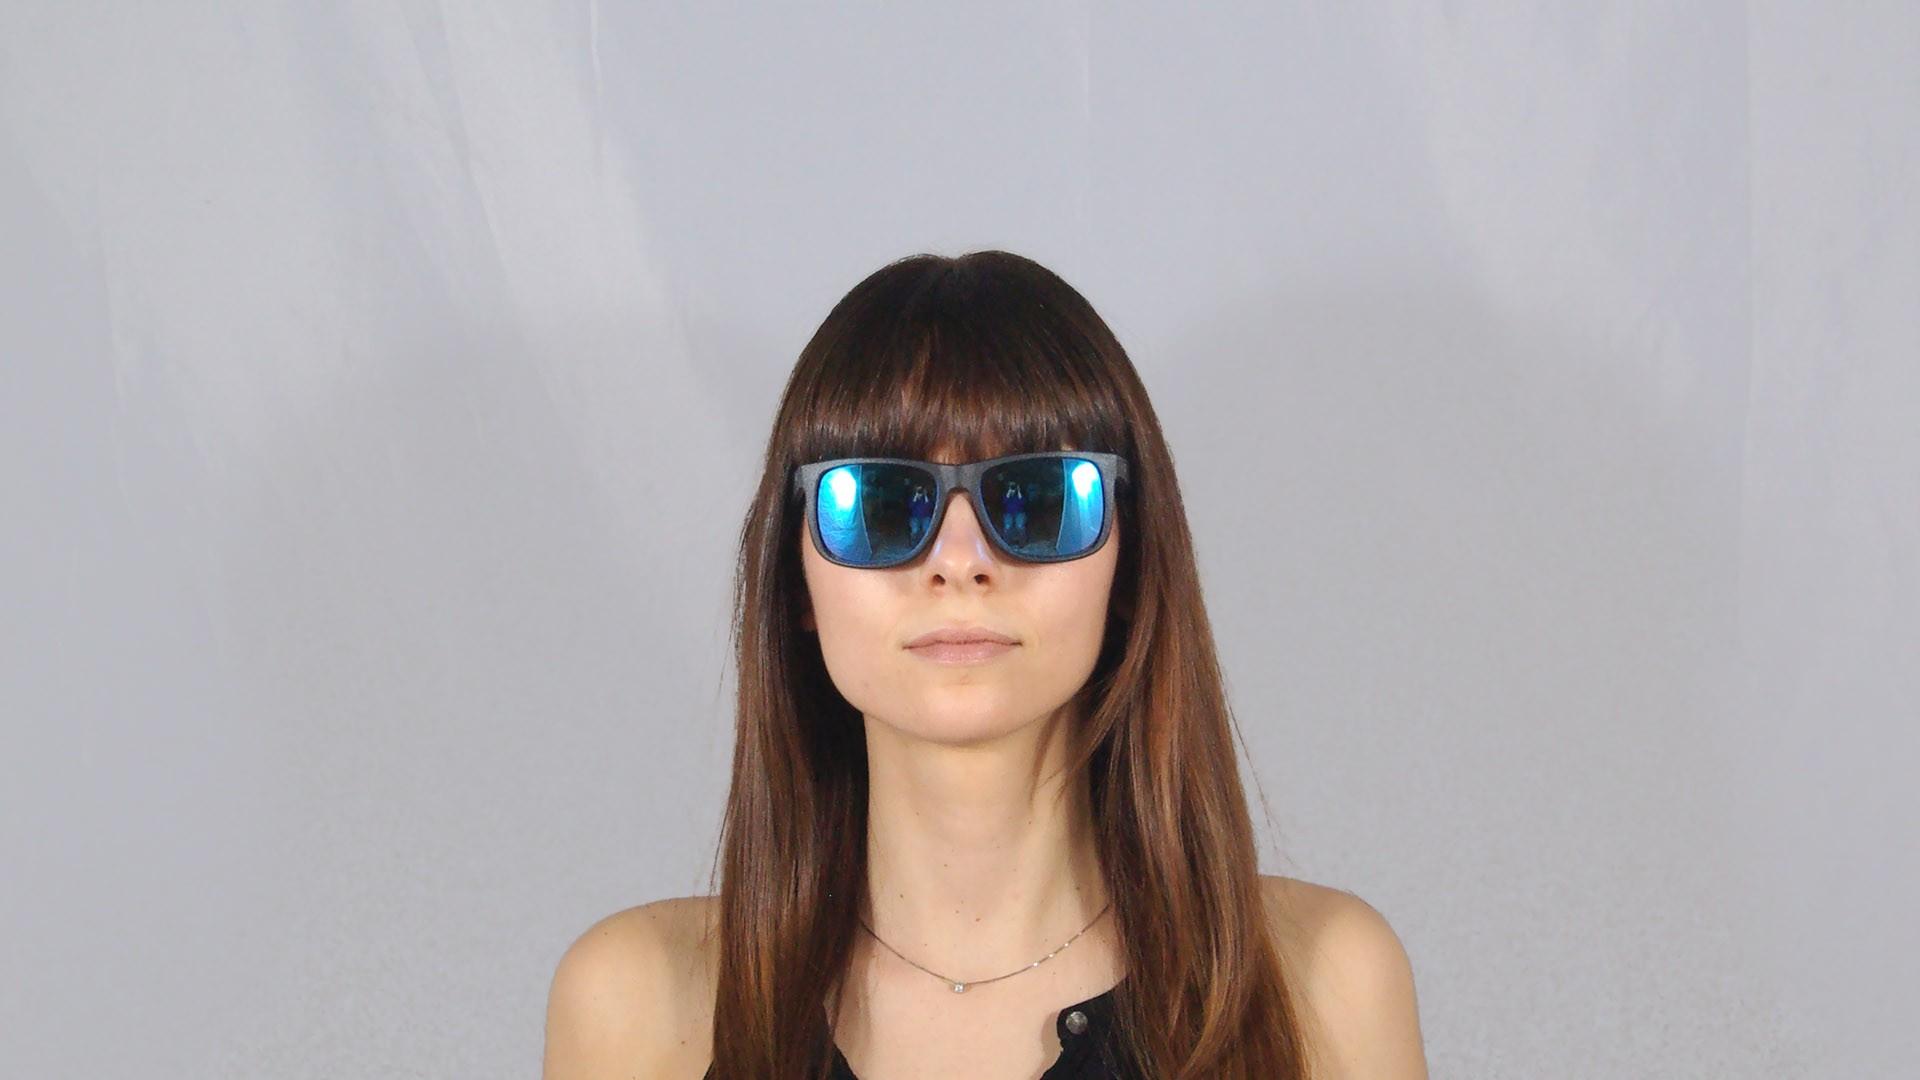 947d5c32bfa2a ... 601 8g 51 sunglasses shade station edcf9 5bbf6  cheap ray ban justin  noir rb4165 622 55 51 16 prix 89 59207 47d56